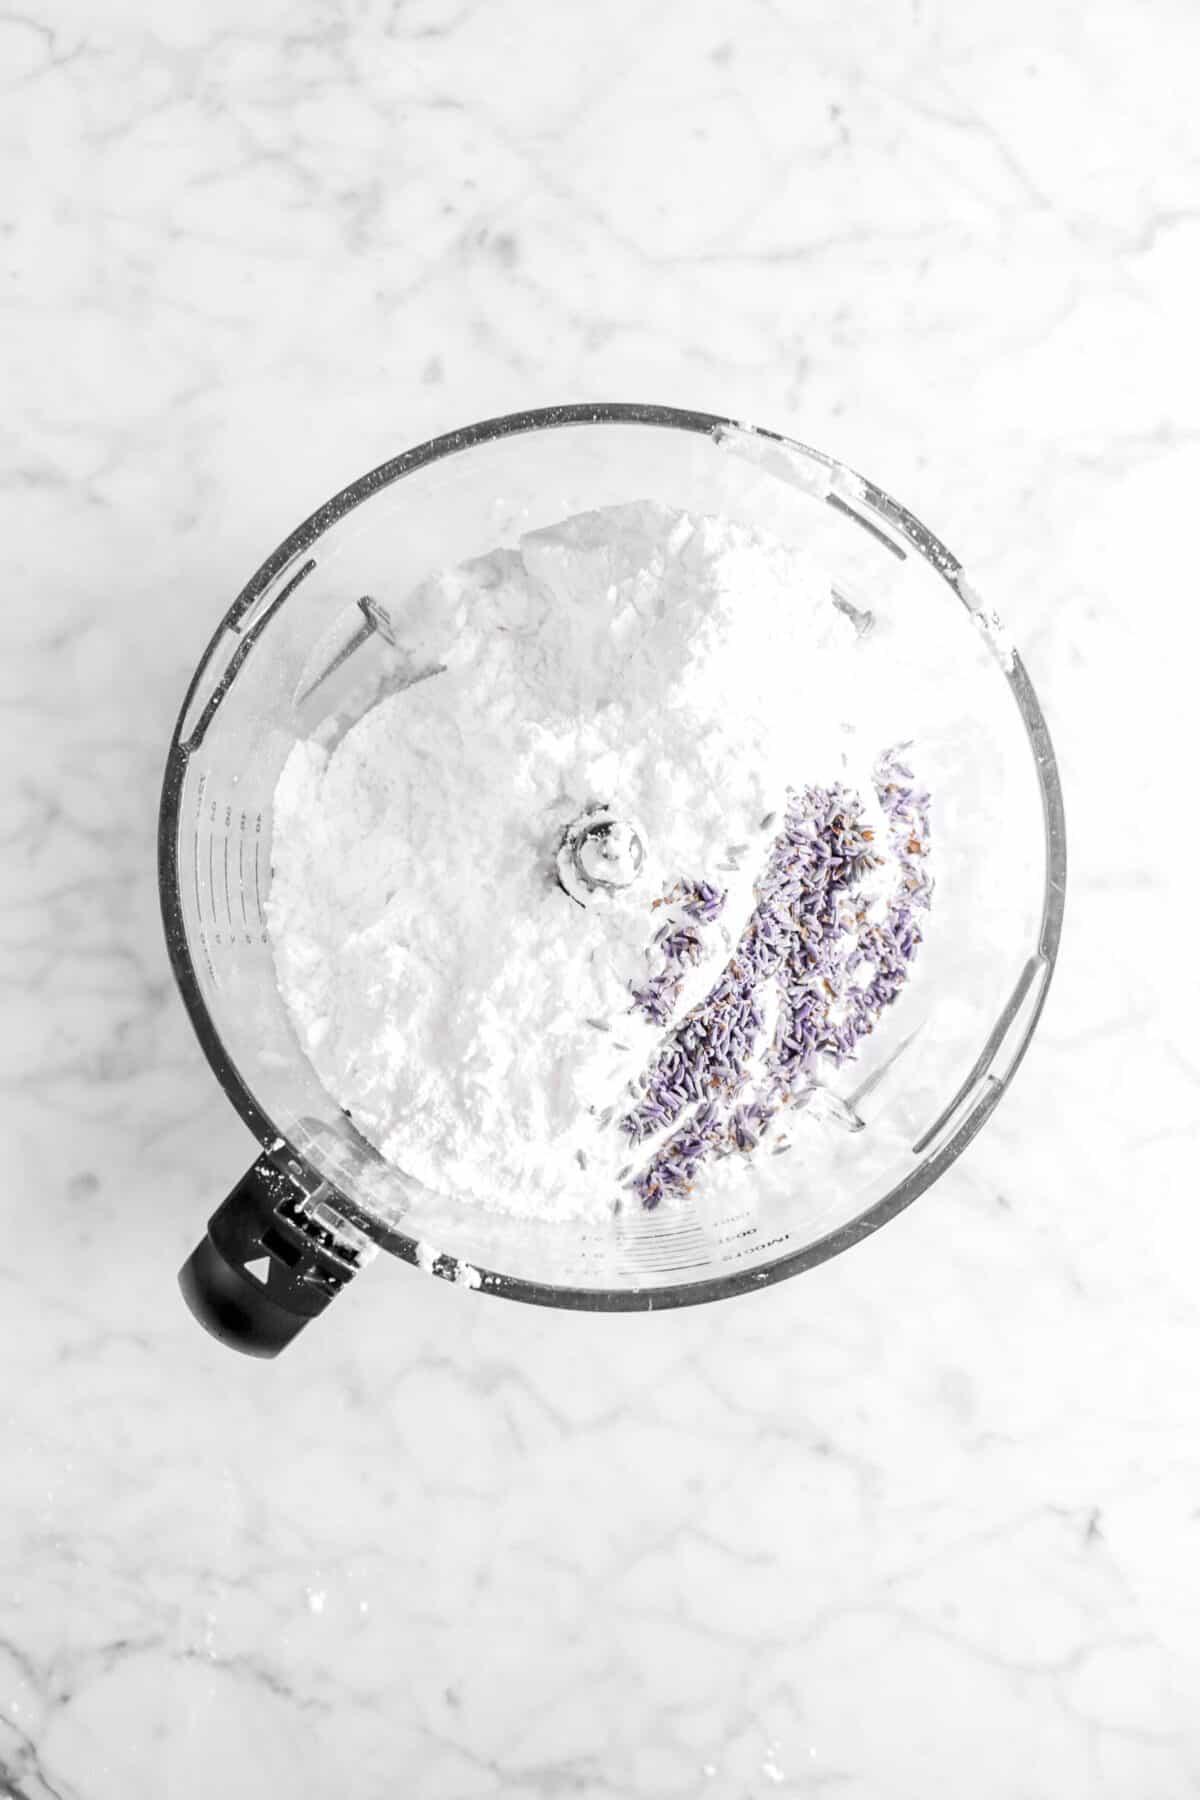 lavender and powdered sugar in food processor